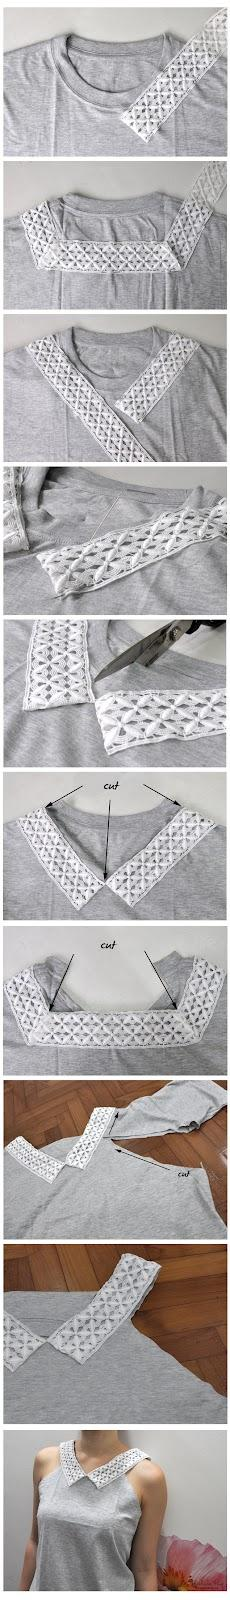 Re-designing a T-Shirt / Разное / Своими руками / Pinme.ru / Юленька Жуйкова